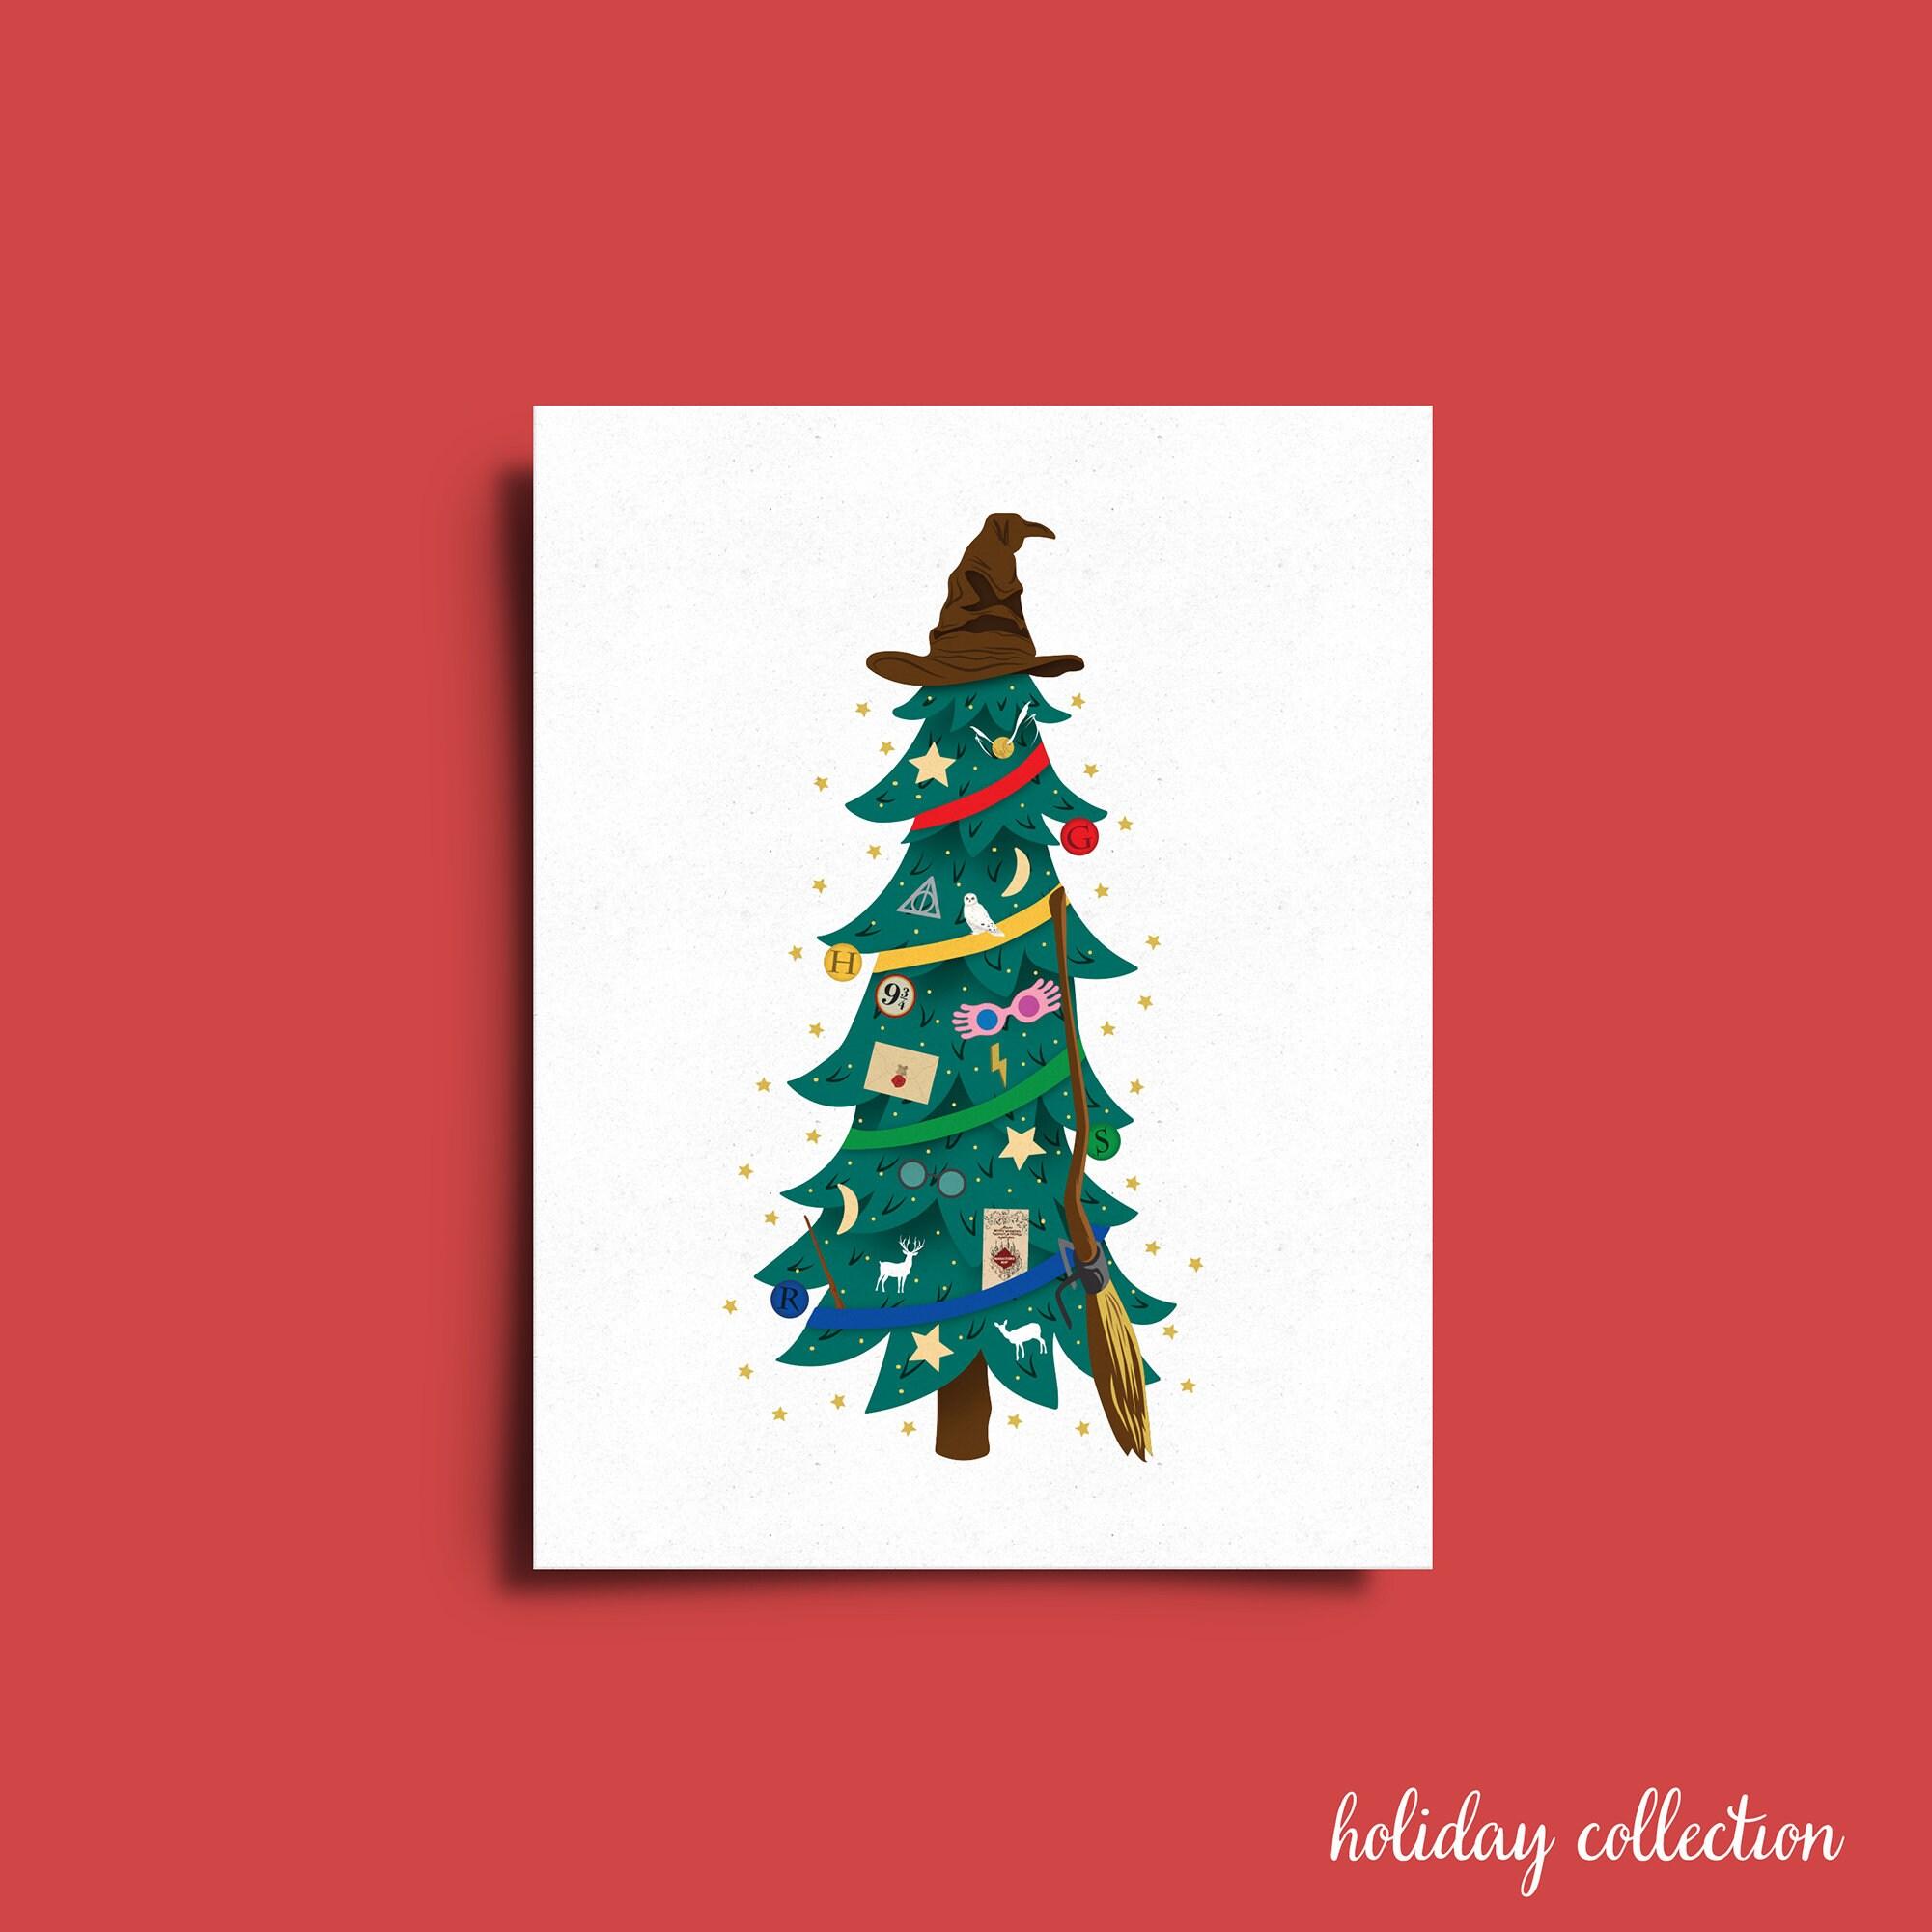 Harry Potter Christmas Tree Greeting Card | Etsy